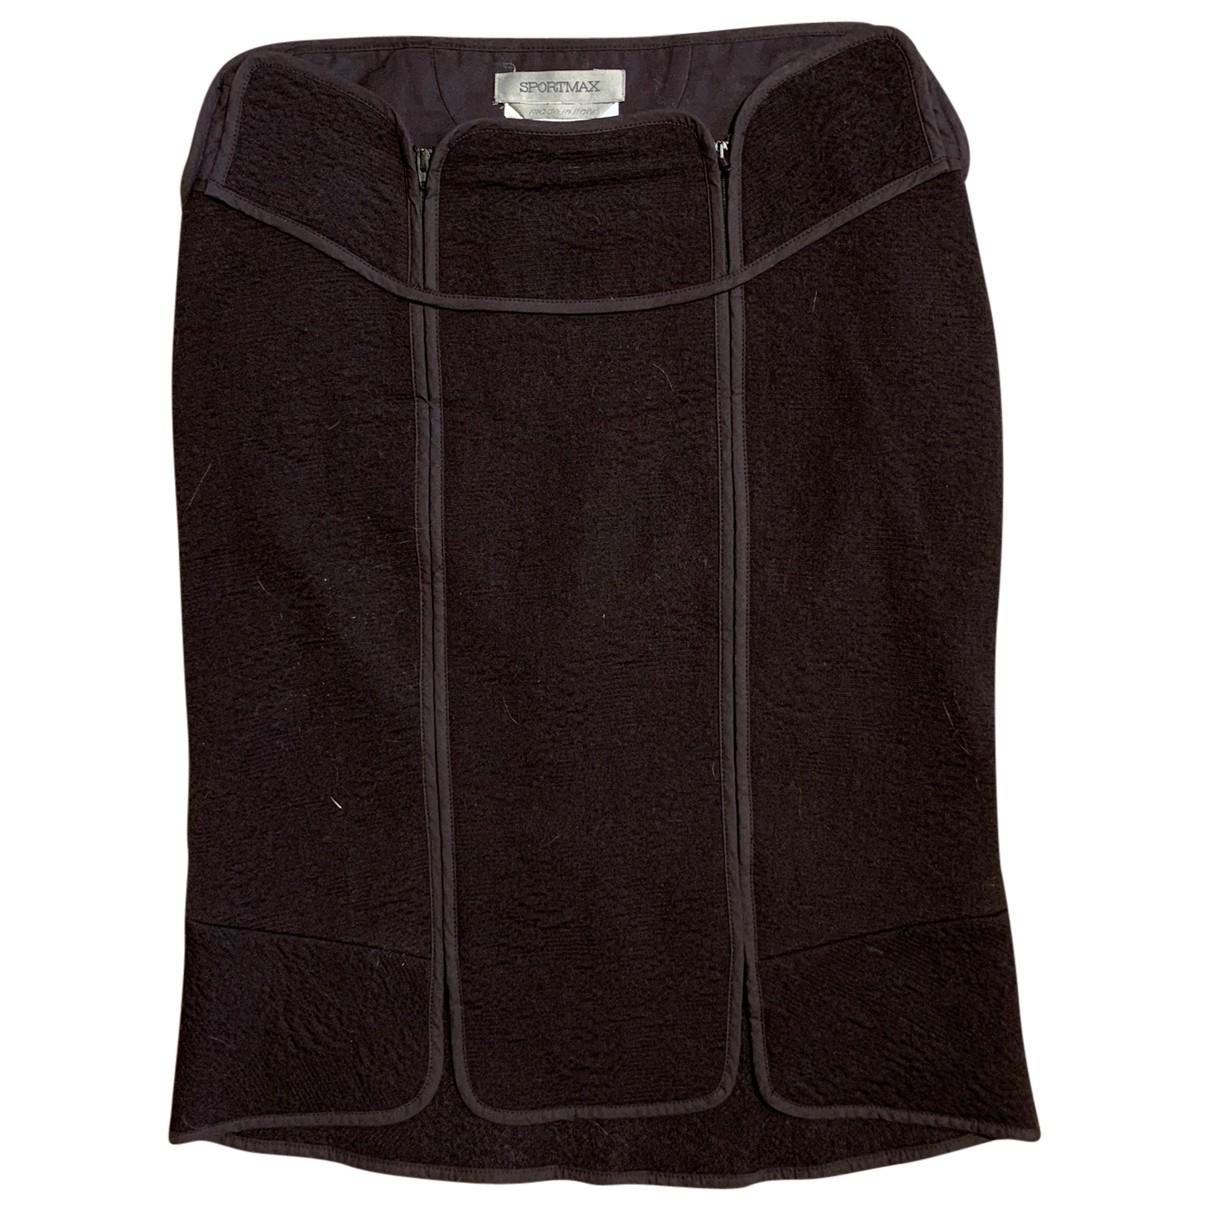 Sport Max \N Brown Cotton skirt for Women 36 FR